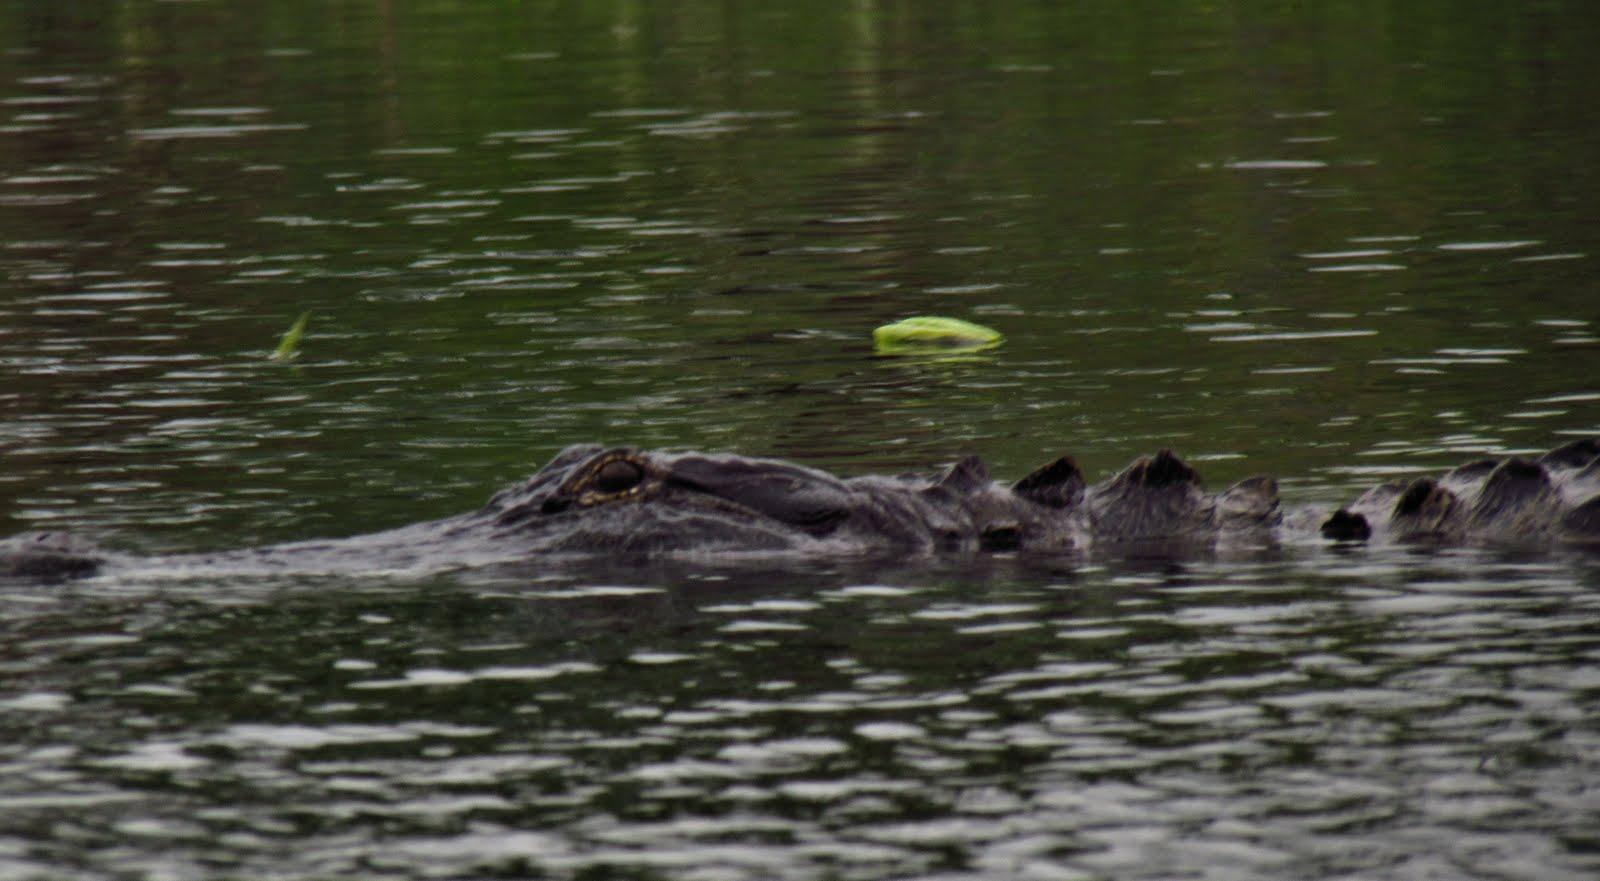 Adventures of a vagabond volunteer paddle at sheldon lake for Sheldon lake fishing